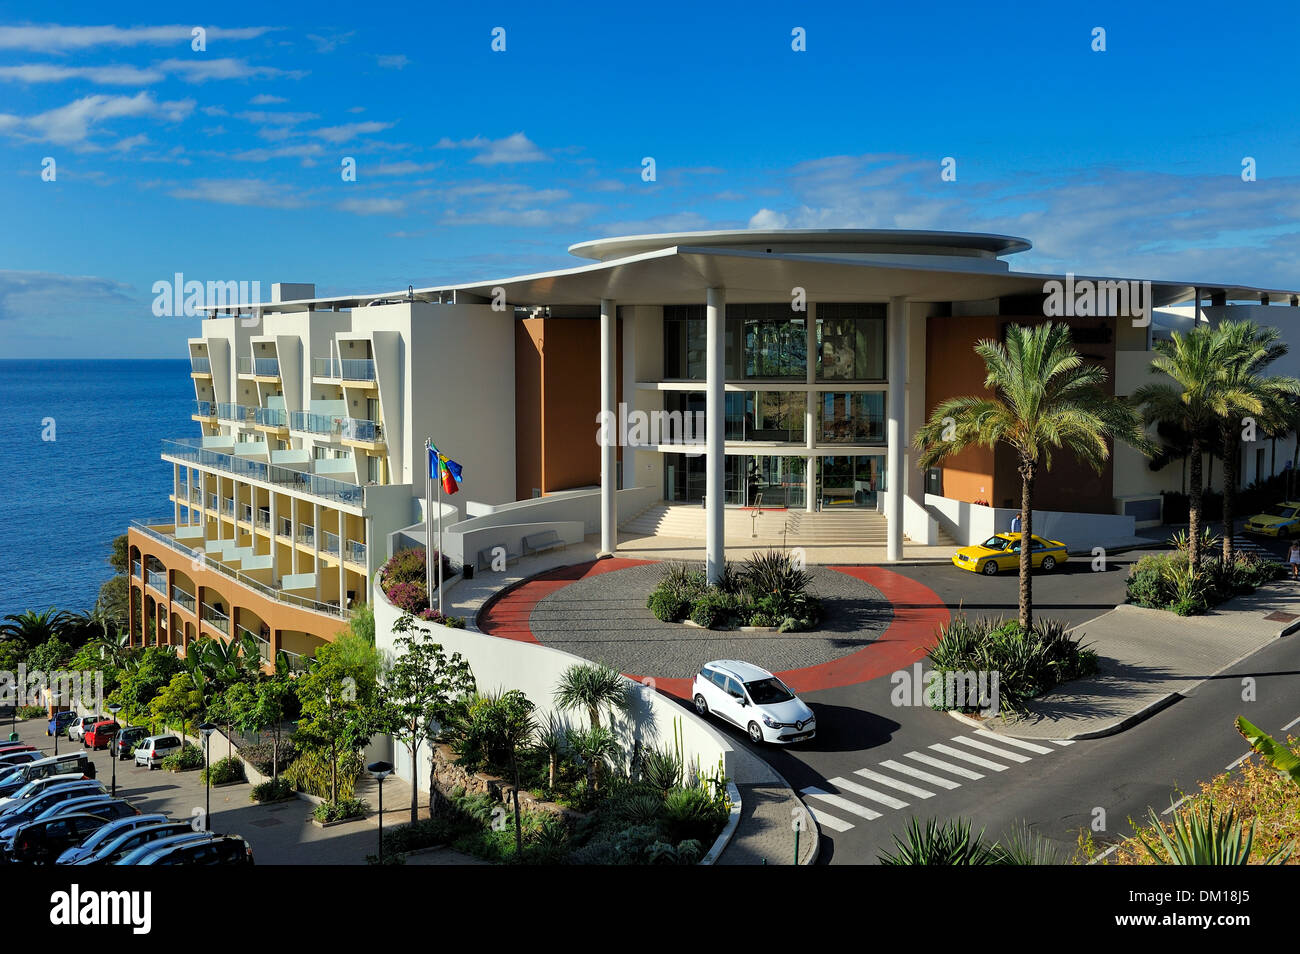 The pestana promenade 4 star hotel